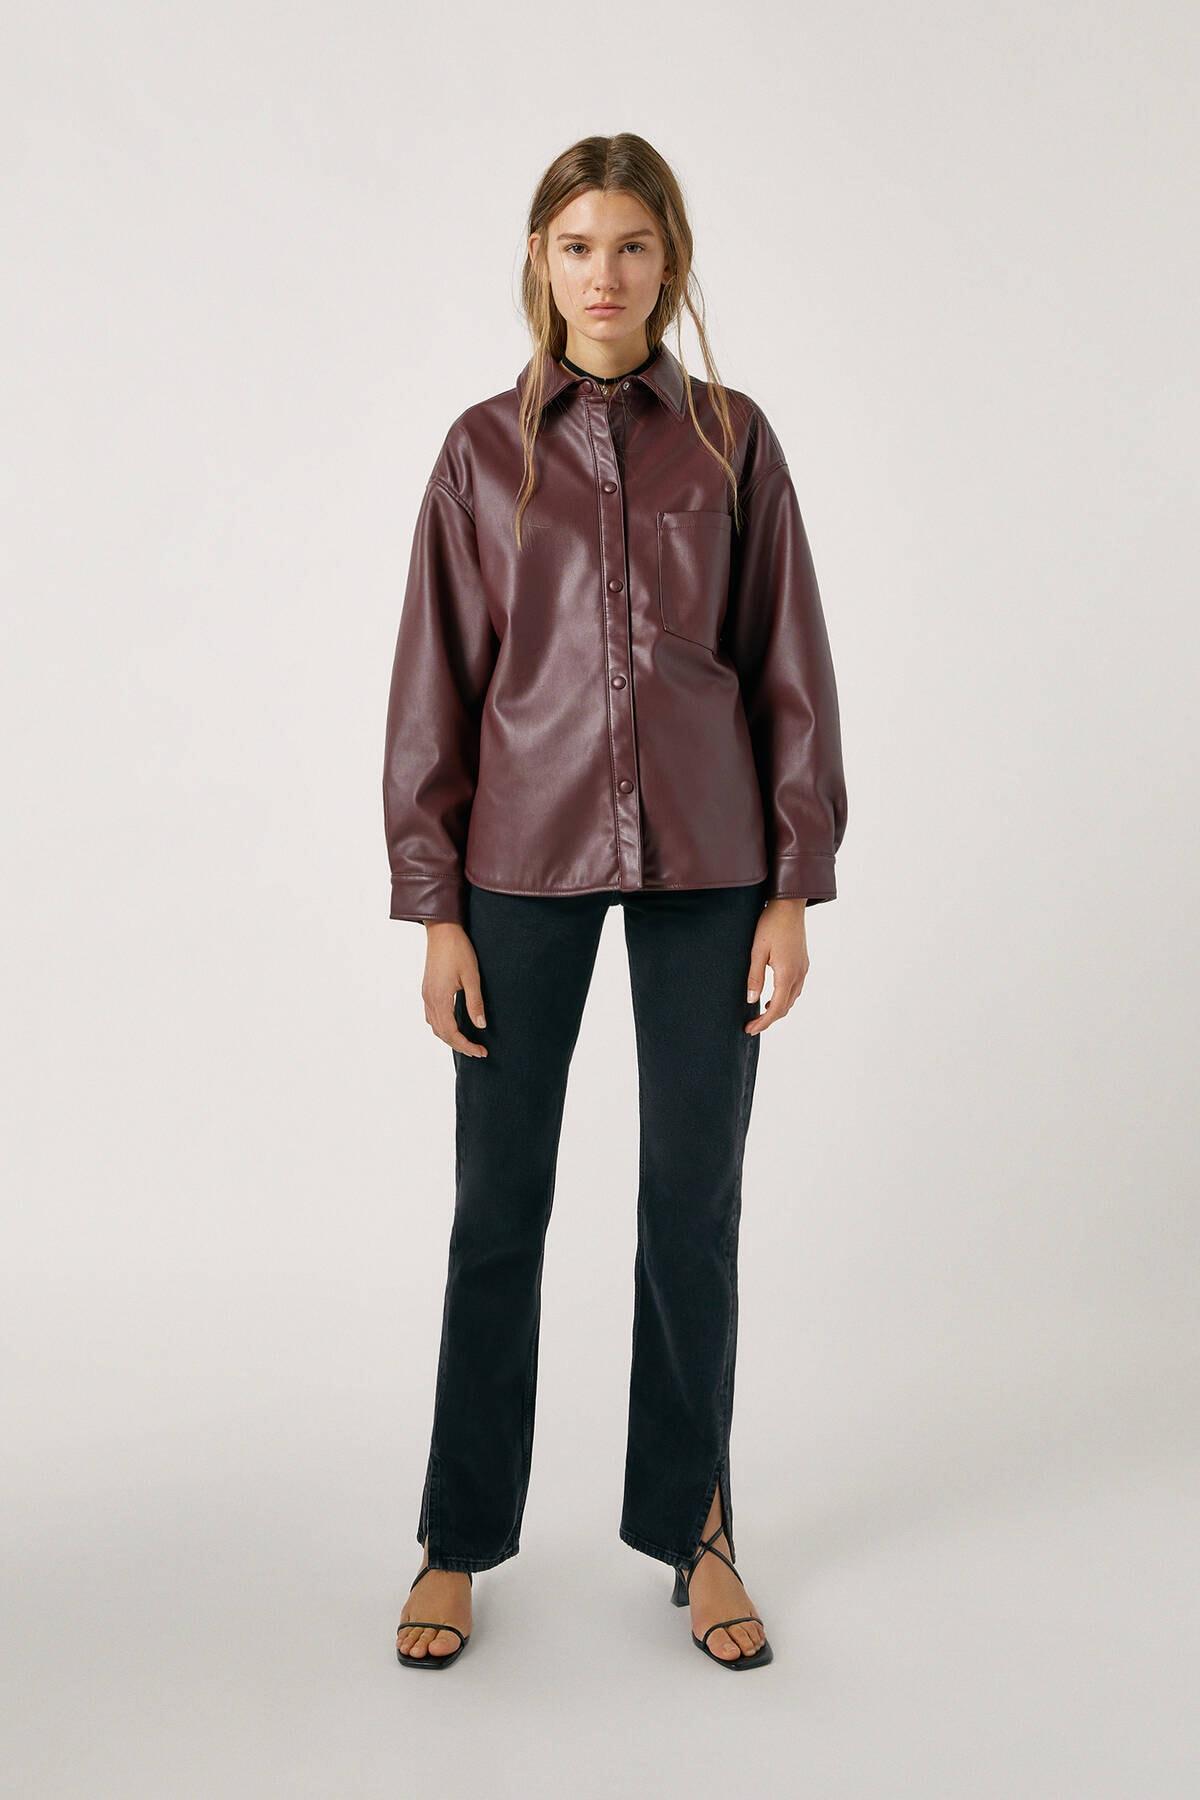 Pull & Bear Kadın Siyah High Waist Jeans With Seam Detail 09683326 0